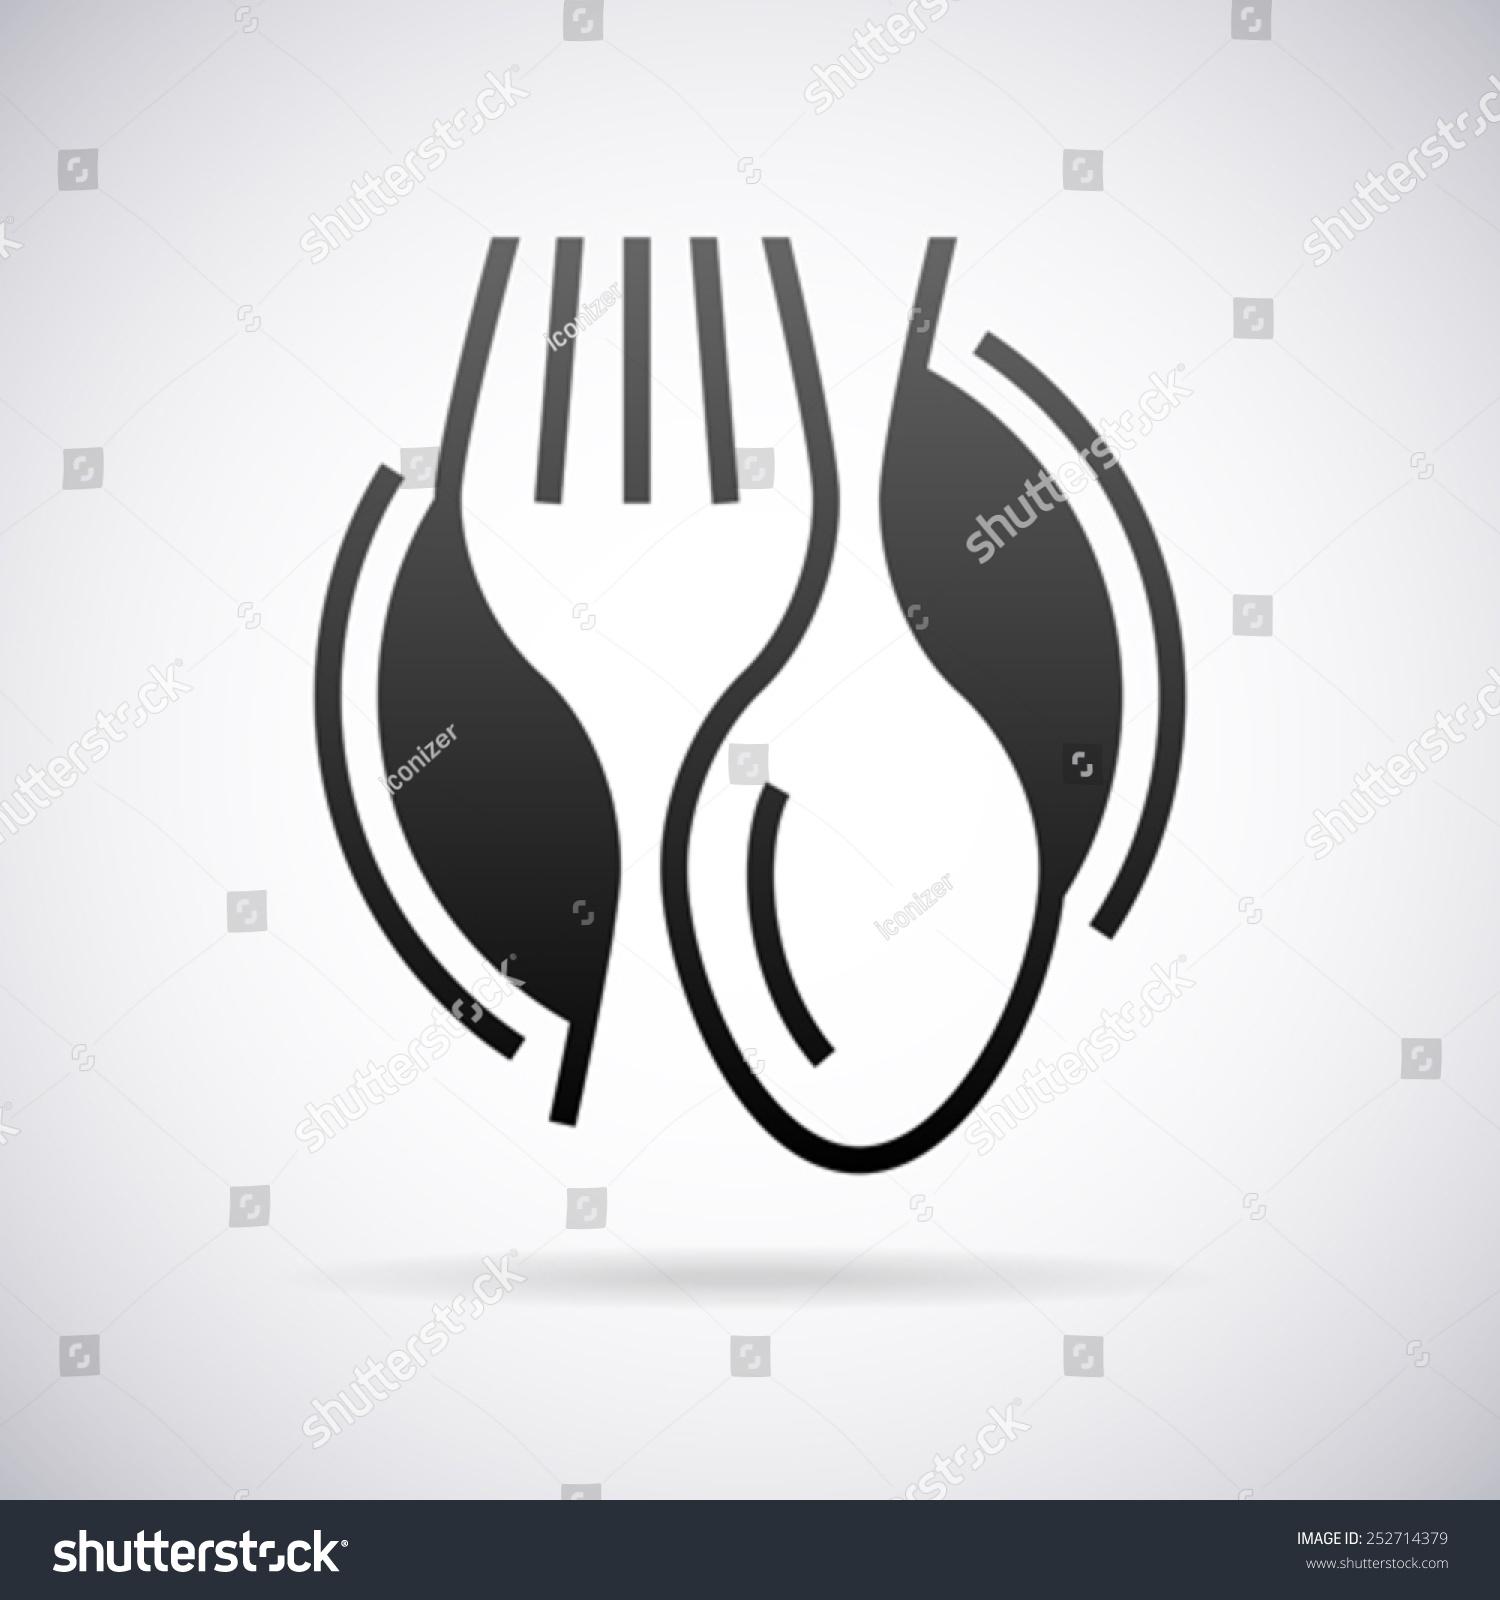 food service vector logo design template stock vector 252714379 food service vector logo design template